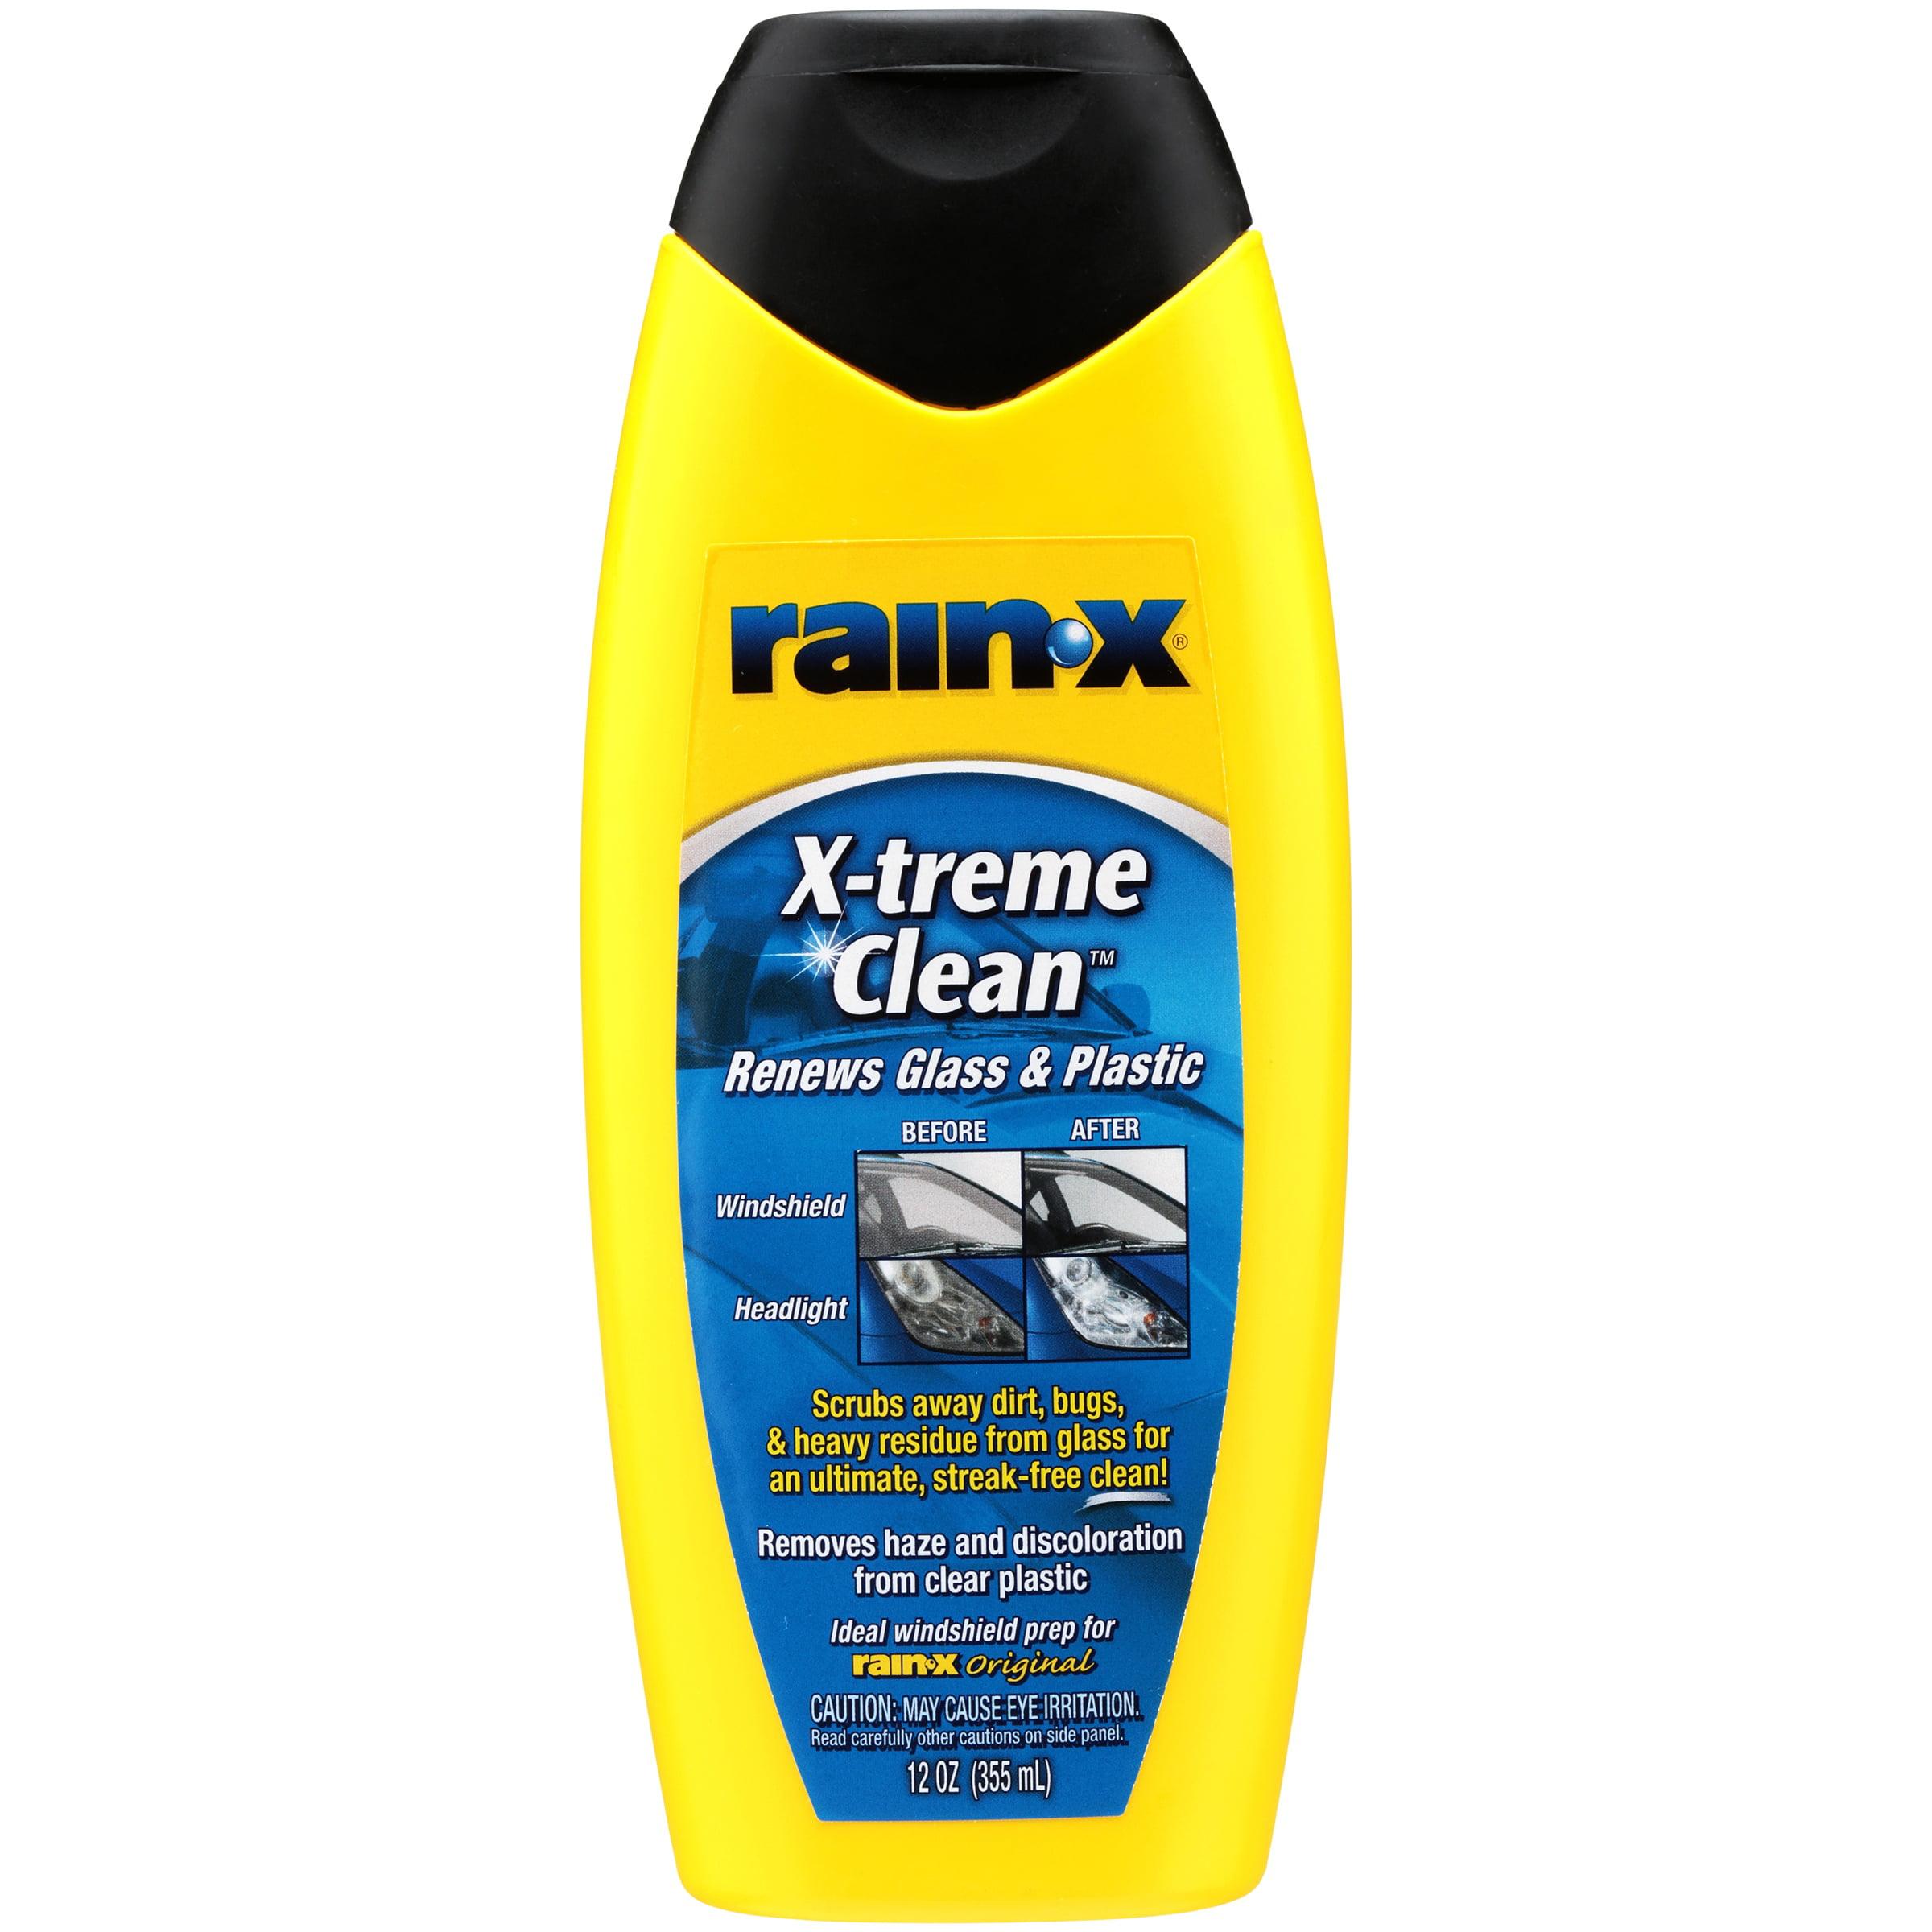 Rain-X X-Treme Clean Clear Surface Cleaner 12 oz  Bottle - 5080217W